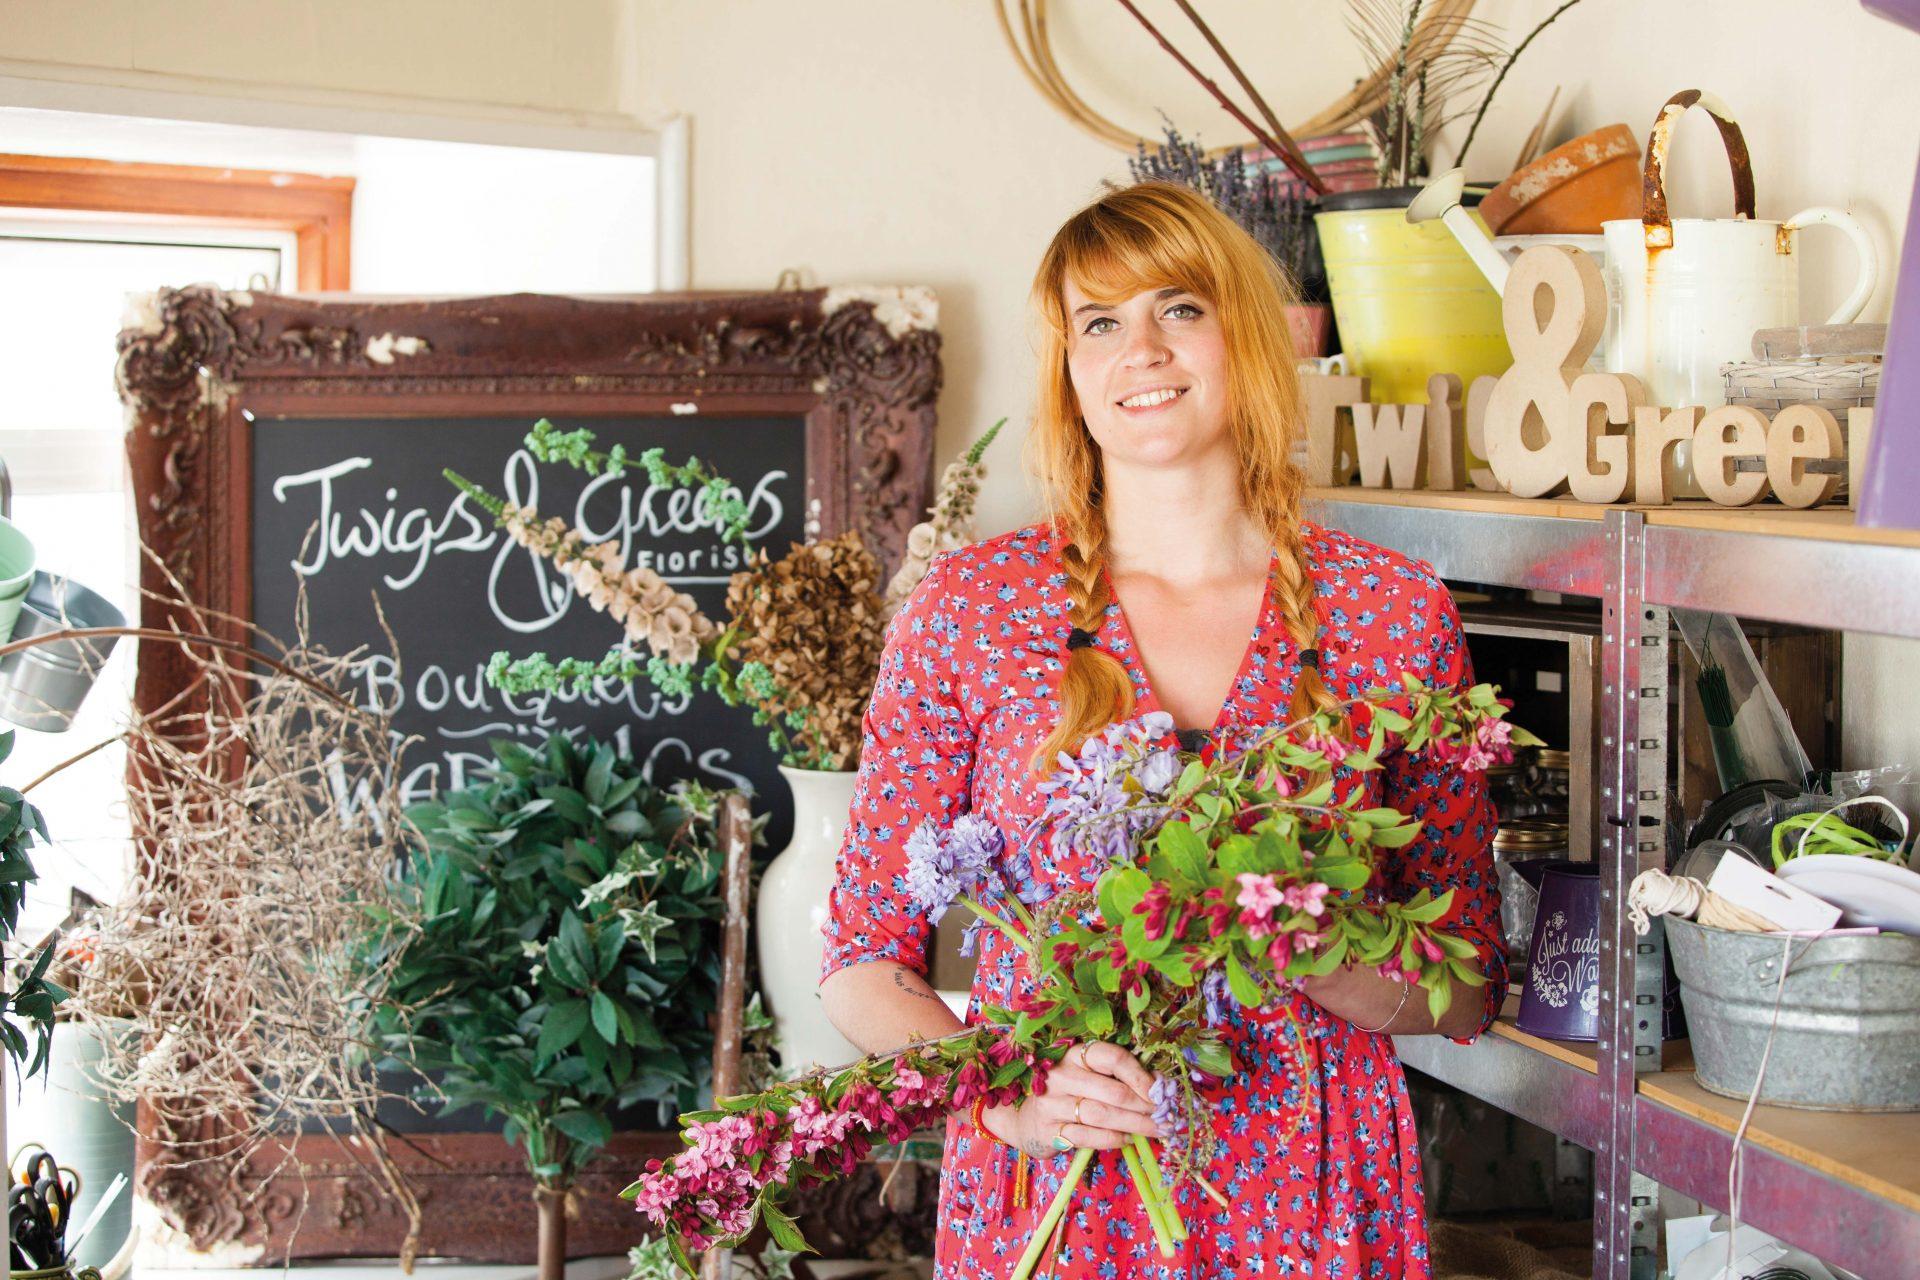 Floristry alumni Jennifer Simpson